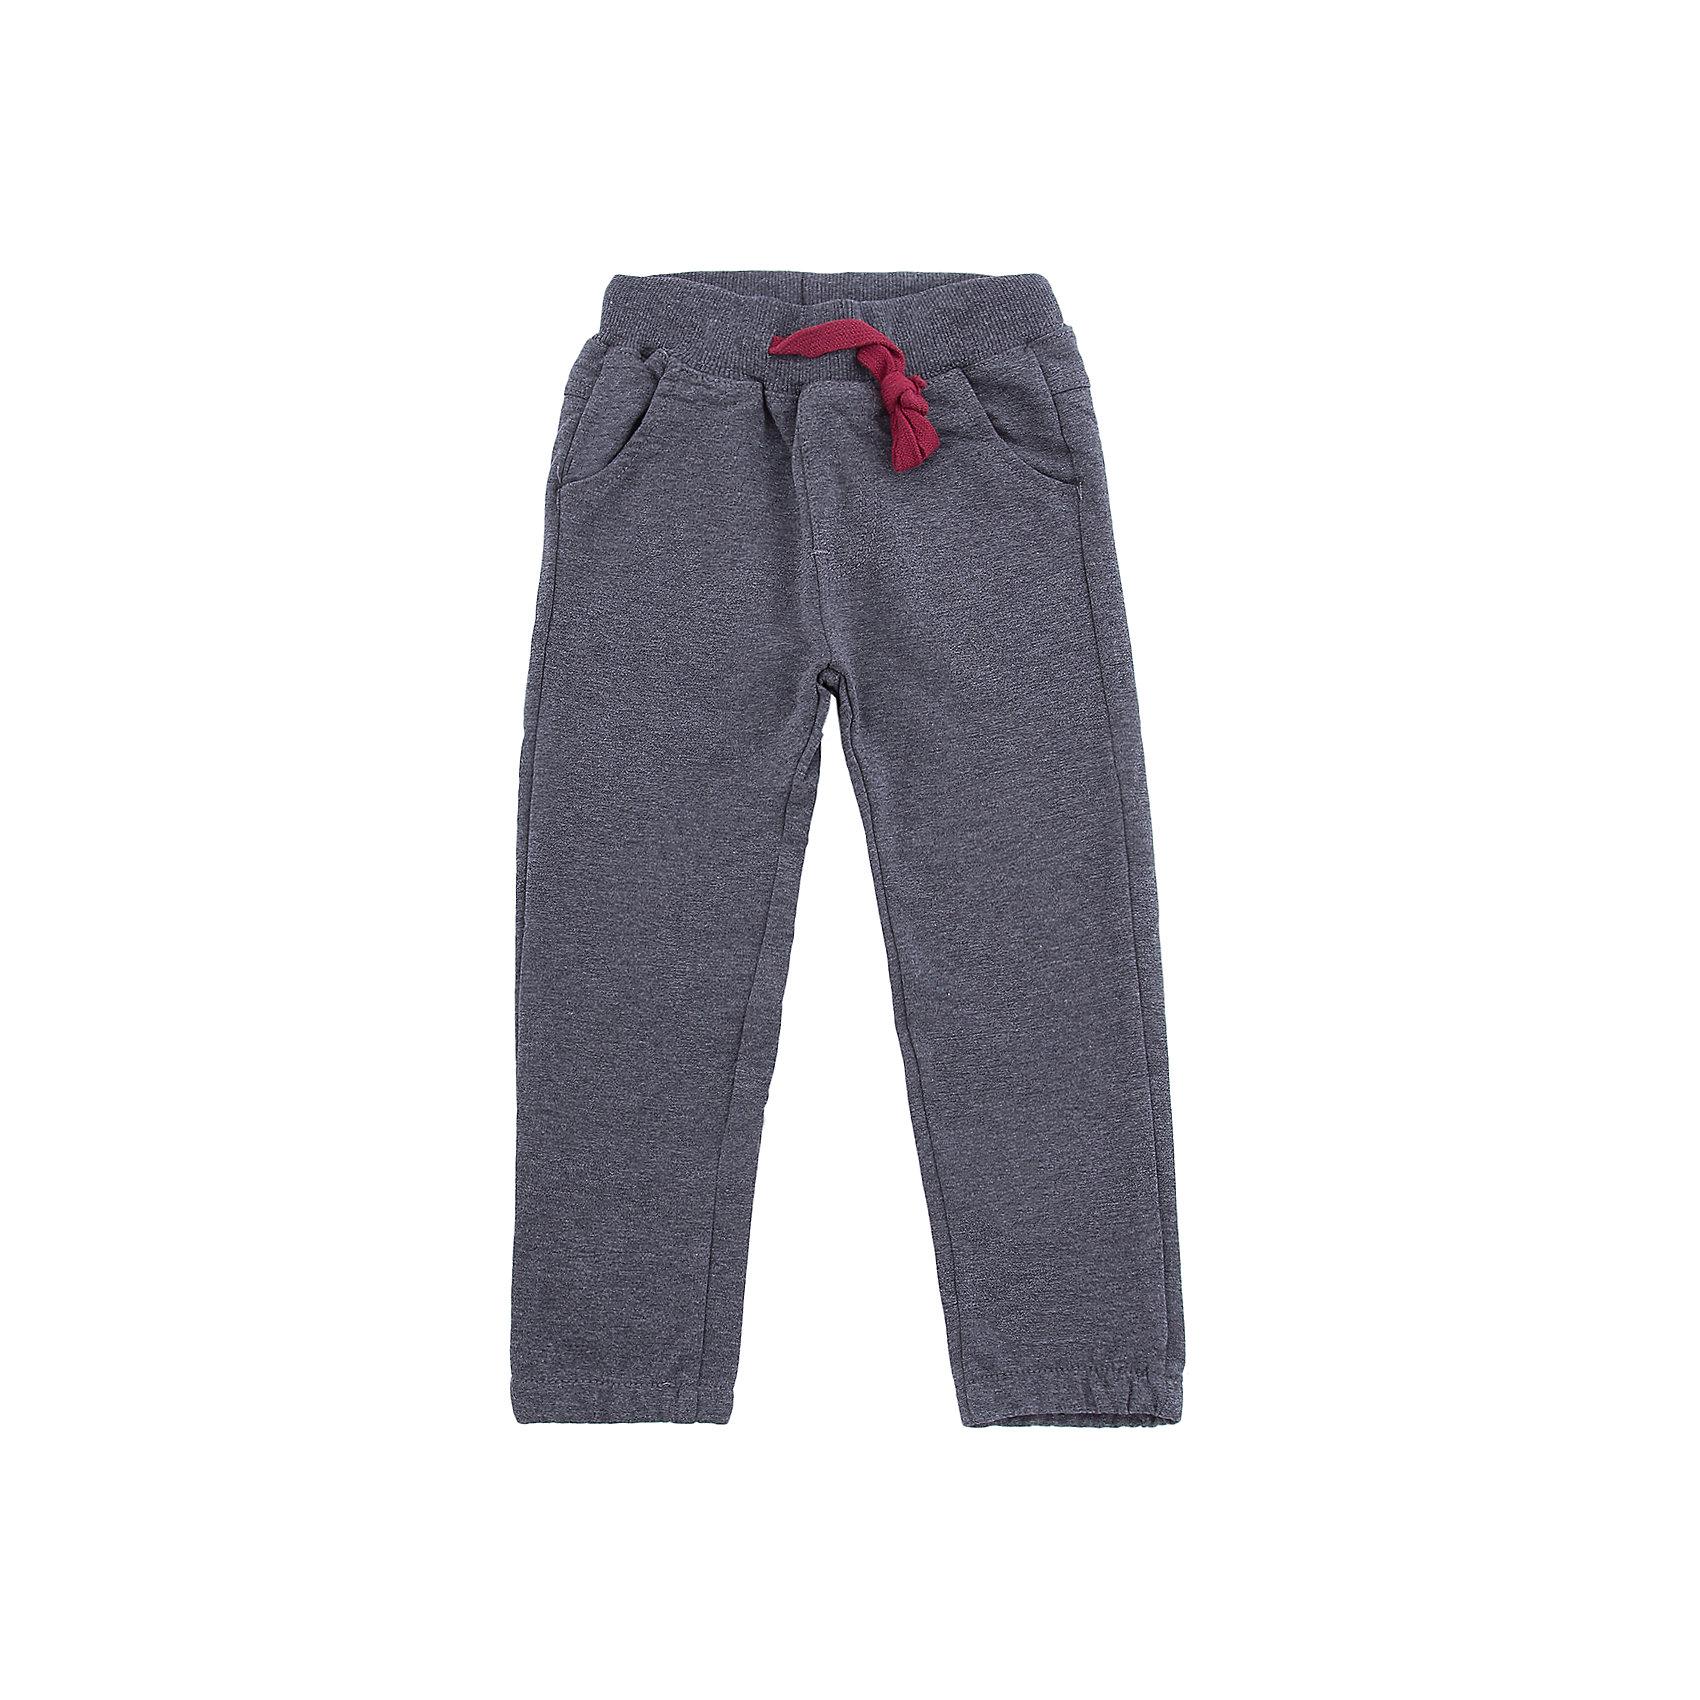 Брюки Sweet Berry для мальчикаБрюки<br>Брюки Sweet Berry для мальчика<br>Трикотажные брюки для мальчика темно-серого цвета, низ брючин собран на мягкую резинку. Пояс-резинка дополнен шнуром для регулирования объема по талии.<br>Состав:<br>95% хлопок, 5% эластан<br><br>Ширина мм: 215<br>Глубина мм: 88<br>Высота мм: 191<br>Вес г: 336<br>Цвет: серый<br>Возраст от месяцев: 24<br>Возраст до месяцев: 36<br>Пол: Мужской<br>Возраст: Детский<br>Размер: 98,104,110,116,122,128<br>SKU: 7094833